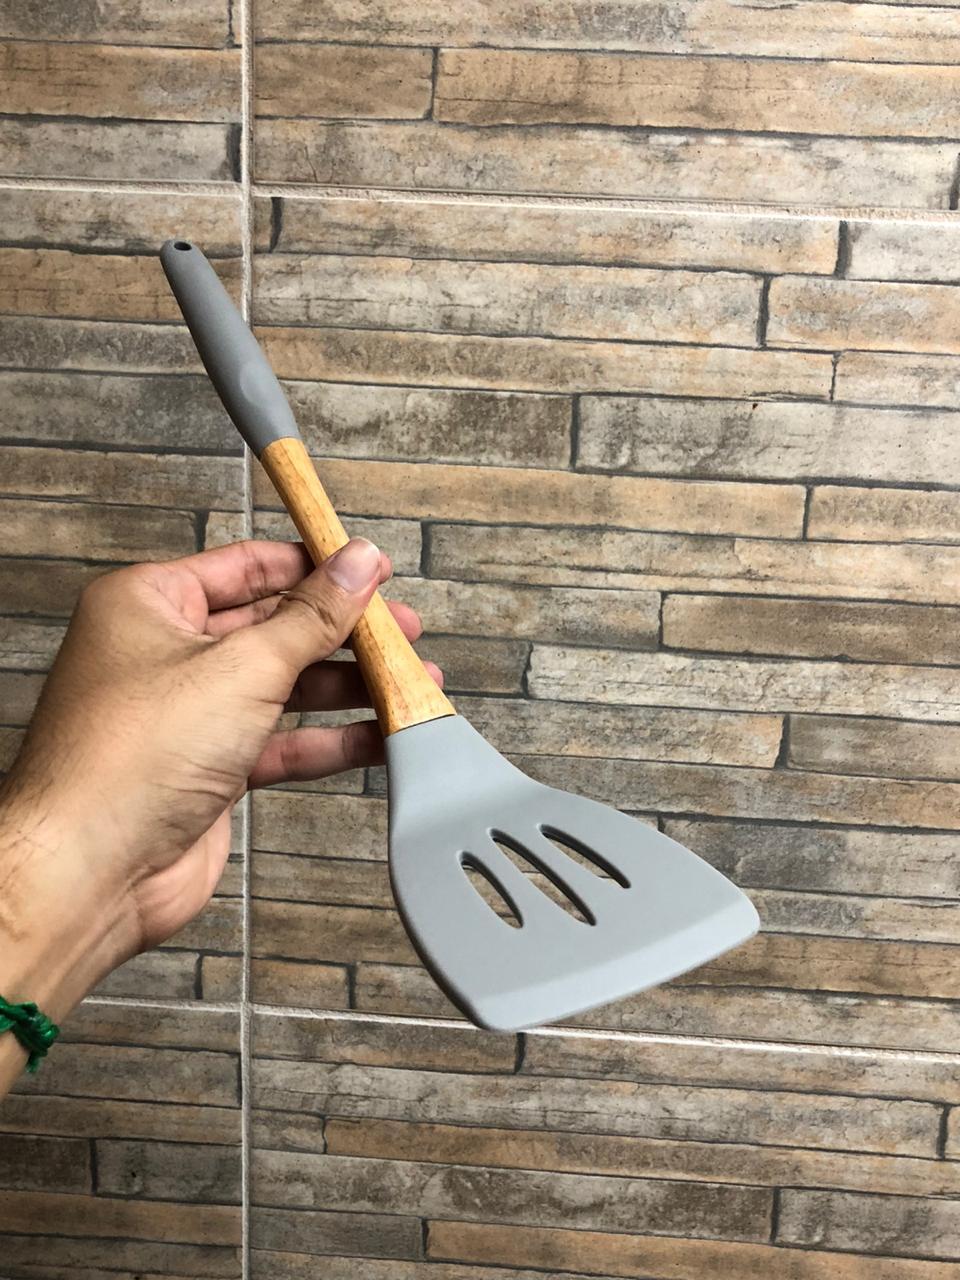 Espátula de silicone cozinha chapeiro lanches vazada fritura azul e madeira 34cm